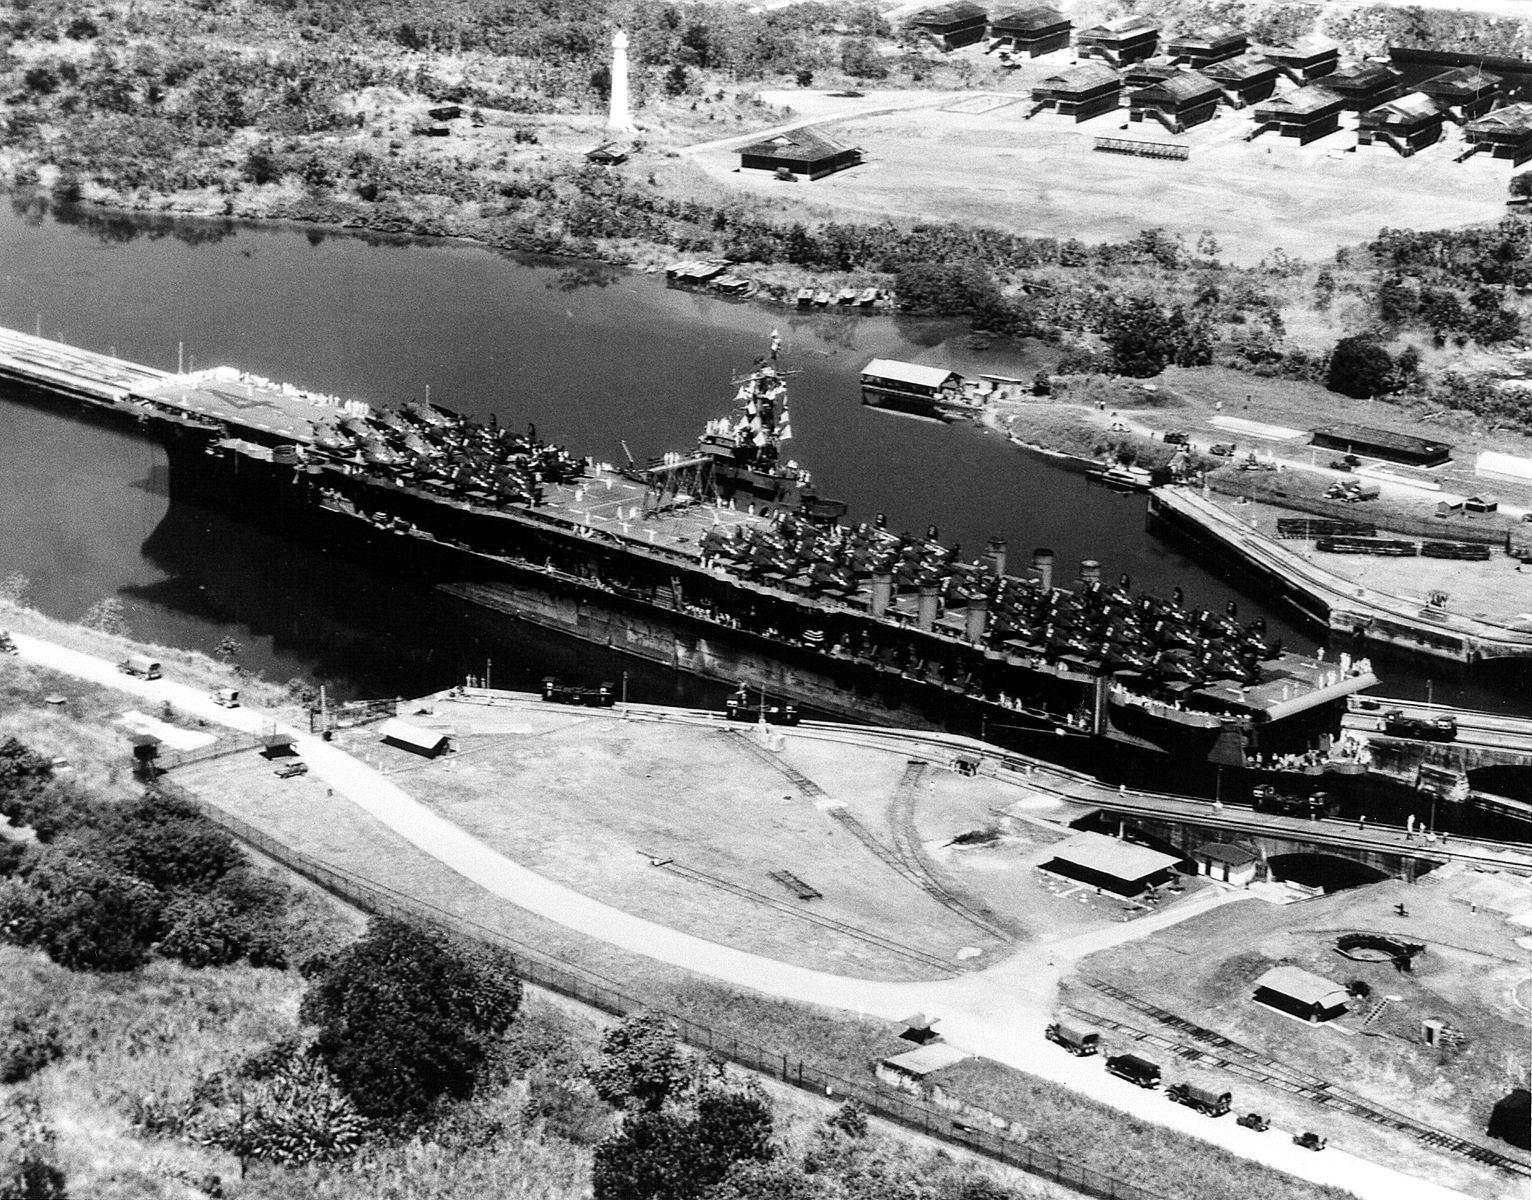 USS Ranger (CV 4) in Panama Canal 1945.jpeg - Le 12 octobre 1945, le USS Ranger passe le canal de Panama